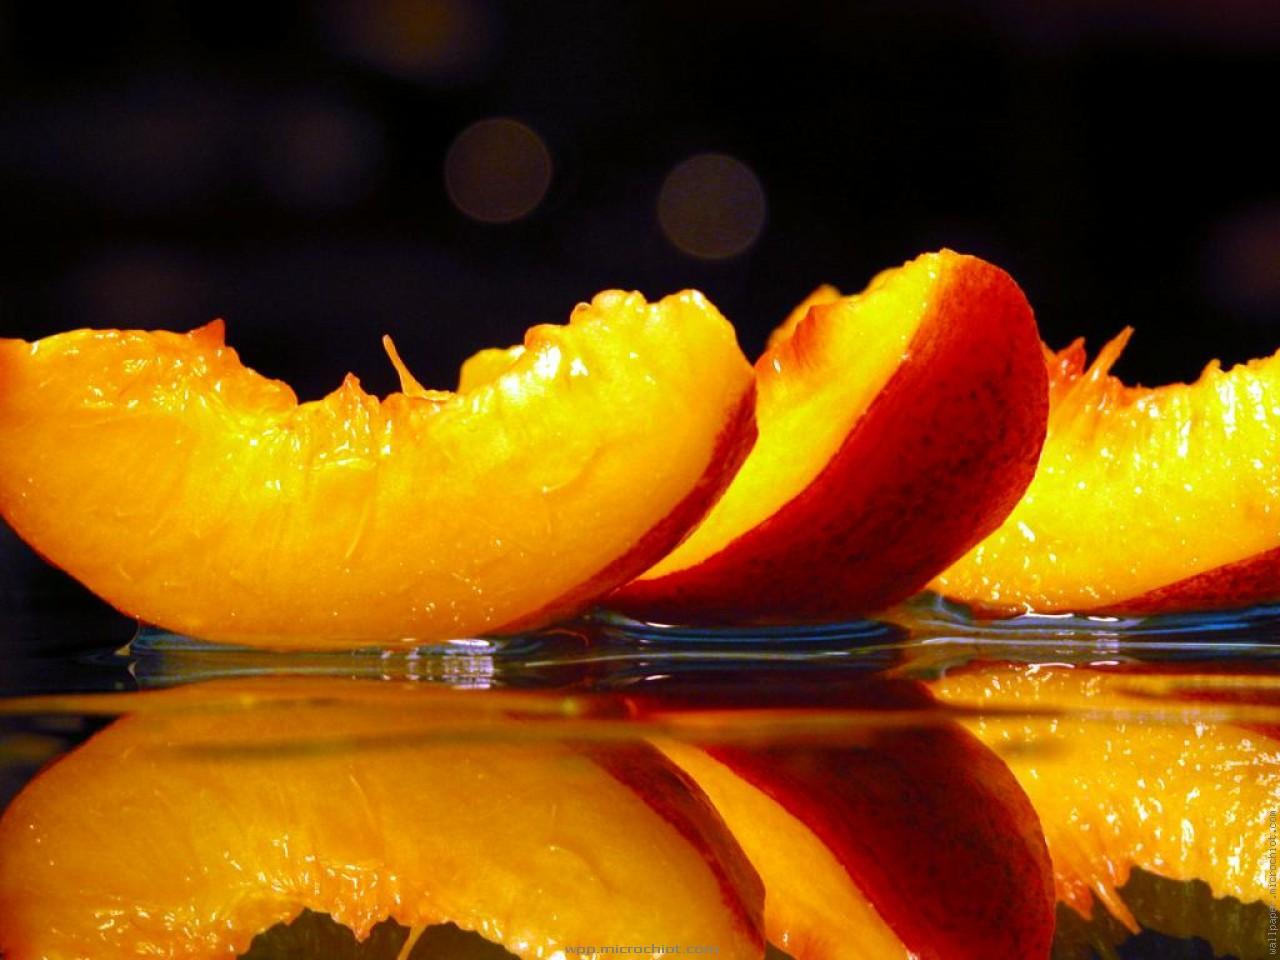 Соковитий персик фото 4 фотография